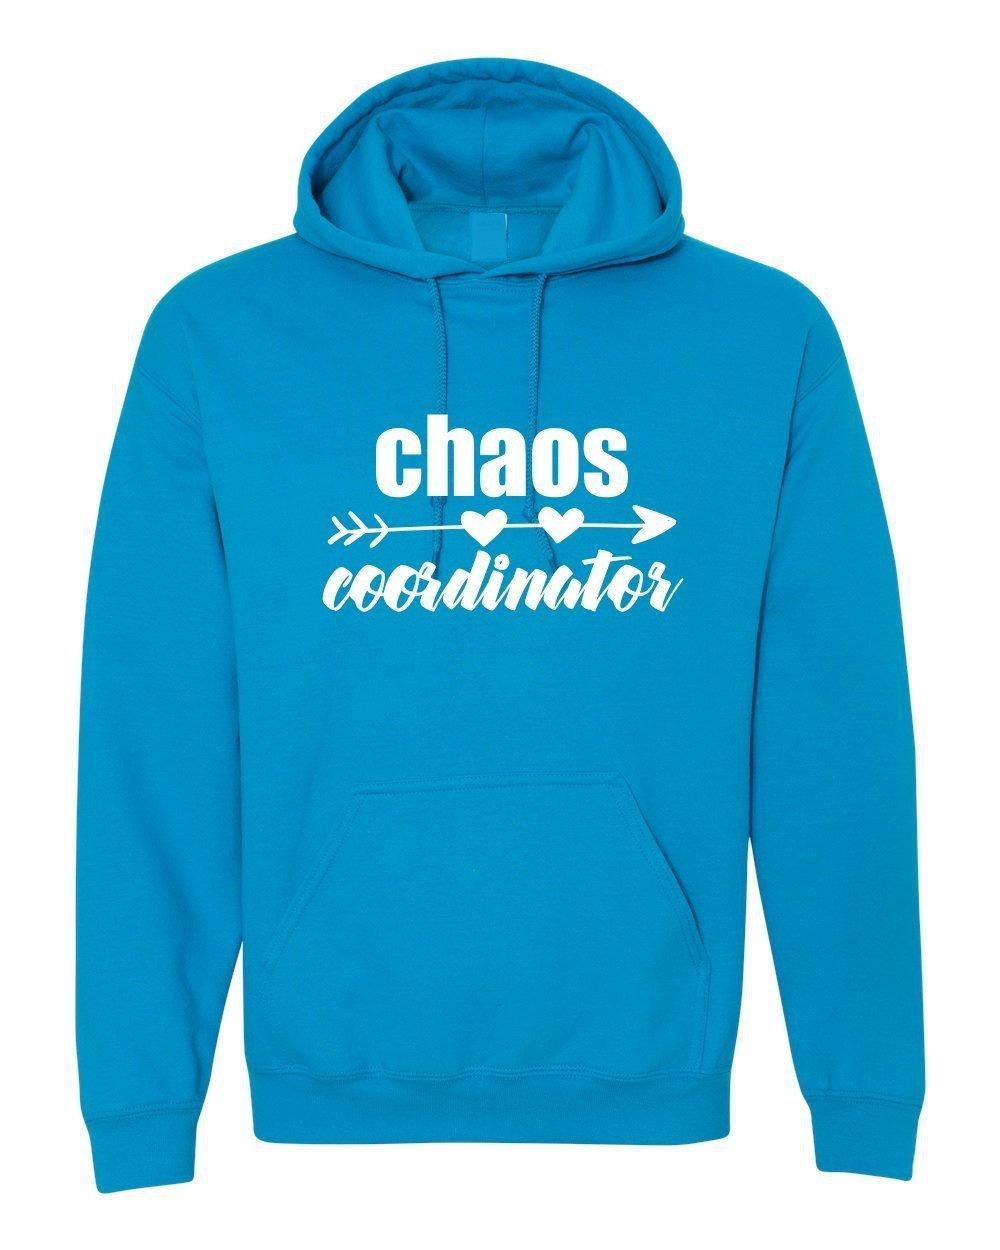 a5306282fd1b Amazon.com  Chaos Coordinator- Warm Heavy Hoodie  Handmade